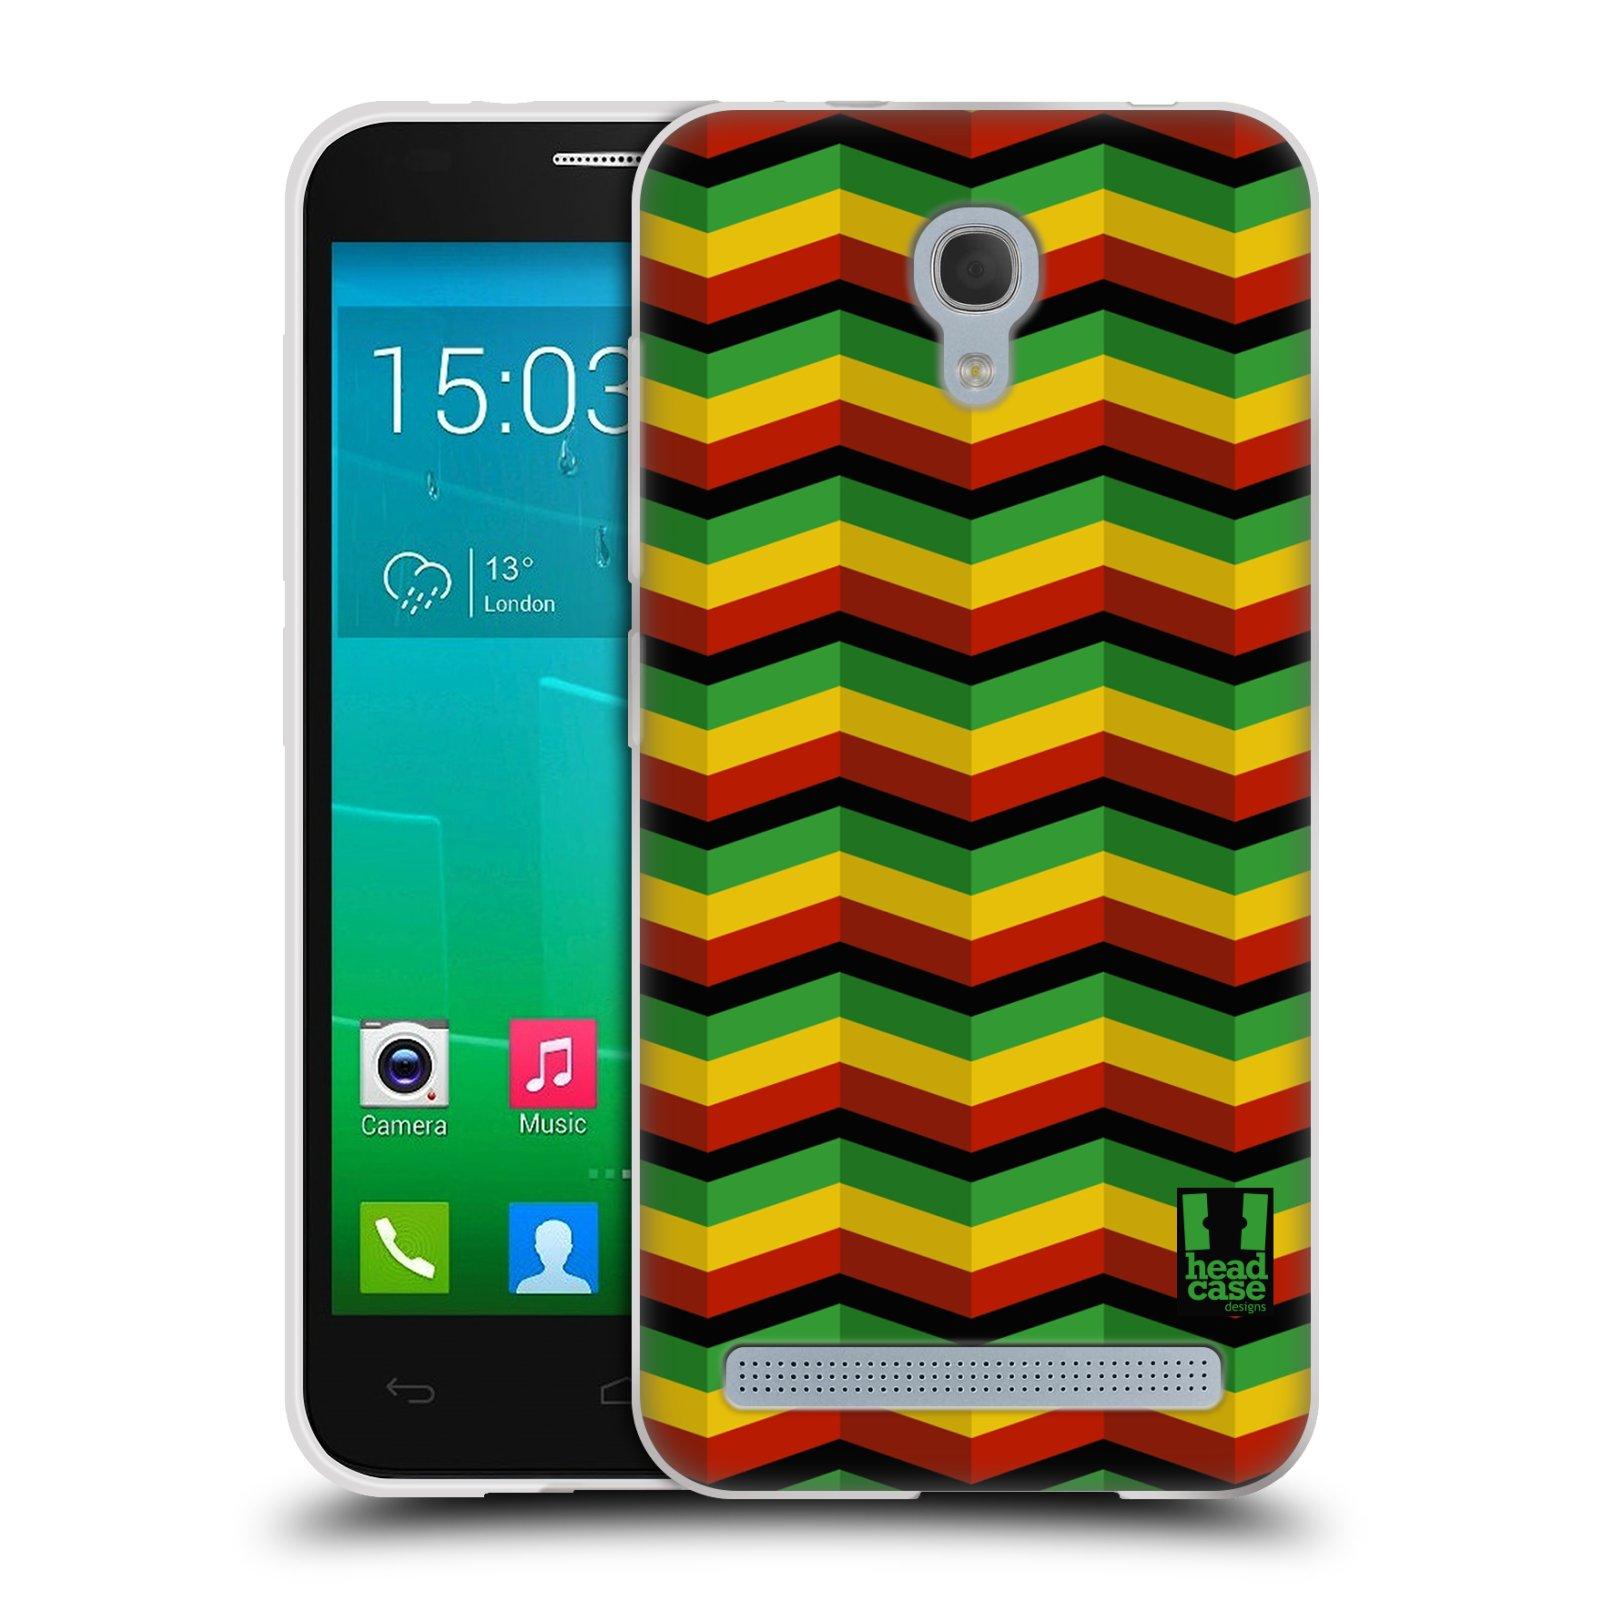 HEAD CASE silikonový obal na mobil Alcatel Idol 2 MINI S 6036Y vzor Rasta barevné vzory CHEVRON